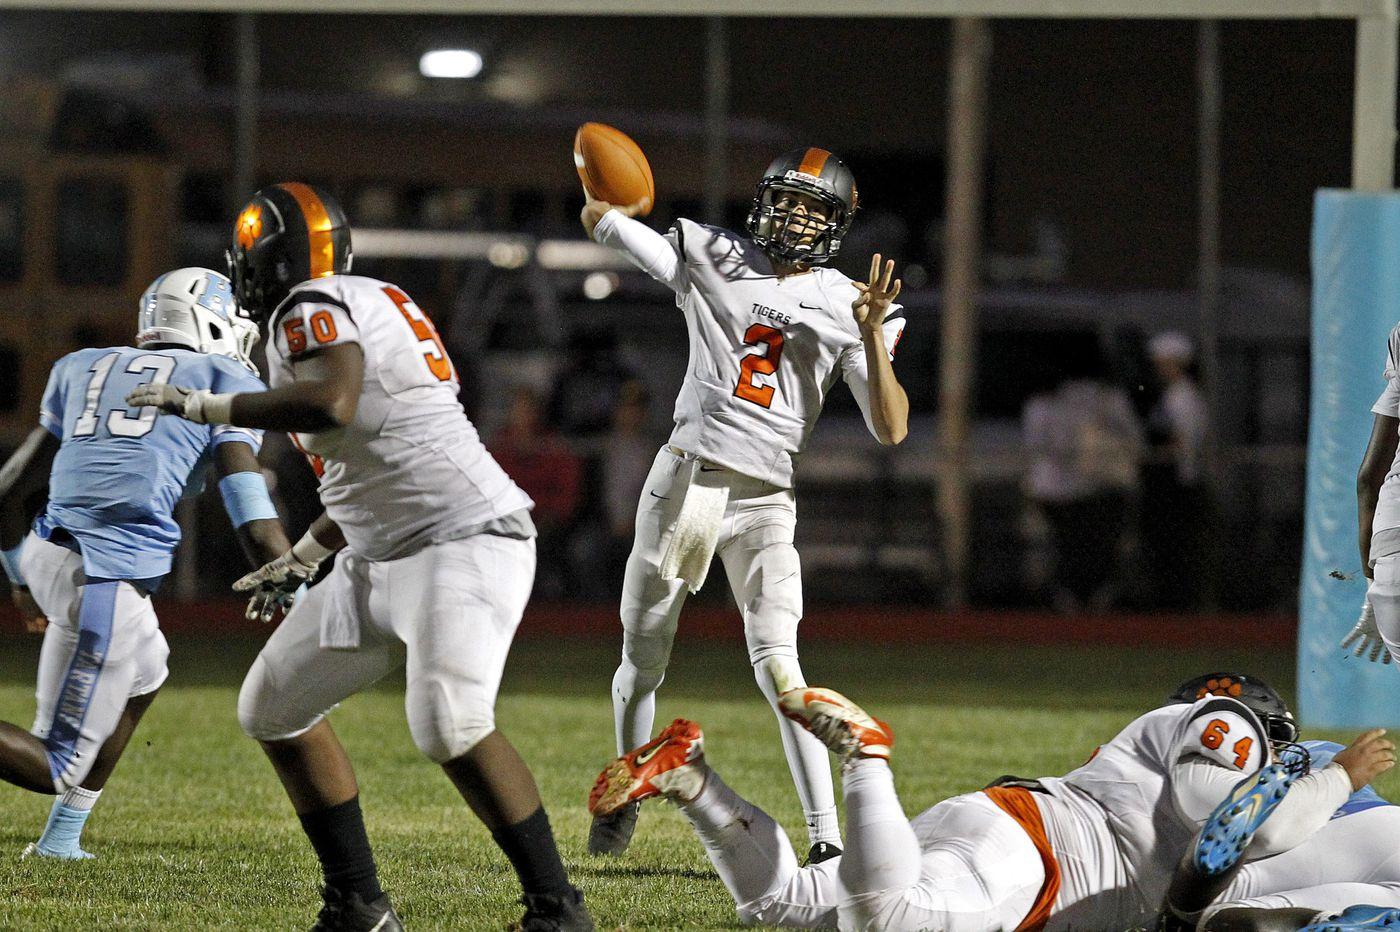 Friday's S.J. high school football roundup: Woodrow Wilson rolls past Winslow Township